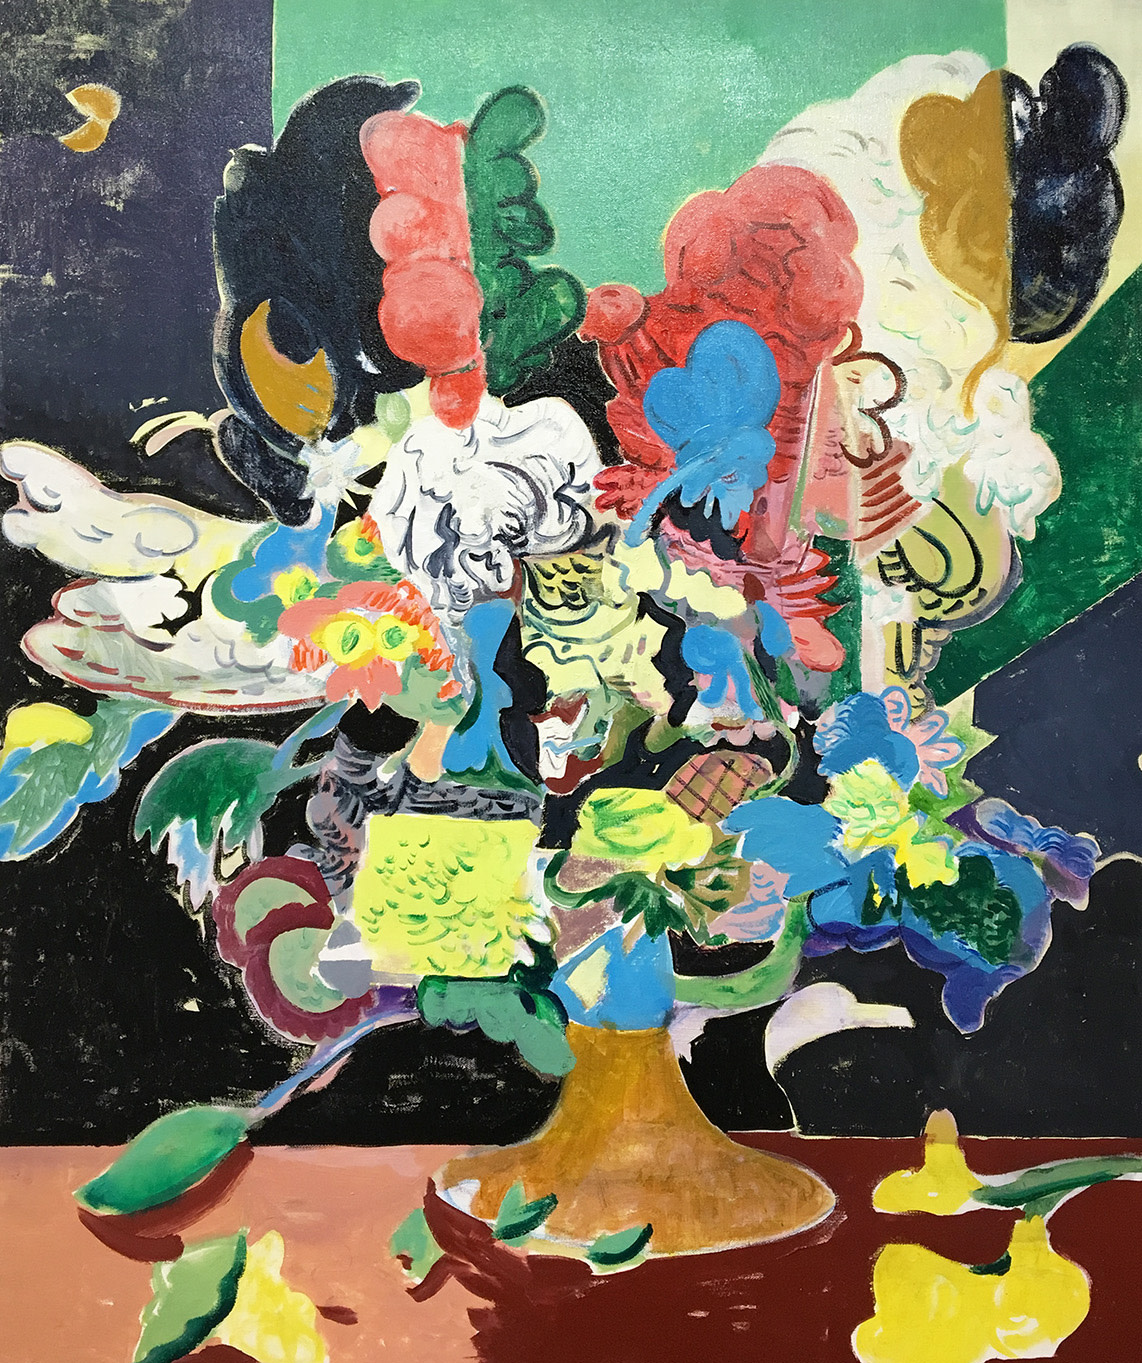 <span class=&#34;link fancybox-details-link&#34;><a href=&#34;/exhibitions/13/works/artworks498/&#34;>View Detail Page</a></span><div class=&#34;artist&#34;><strong>David Price</strong></div><div class=&#34;title&#34;><em>Still Life, June</em>, 2018</div><div class=&#34;medium&#34;>Oil on canvas</div><div class=&#34;dimensions&#34;>100 x 81cm</div>